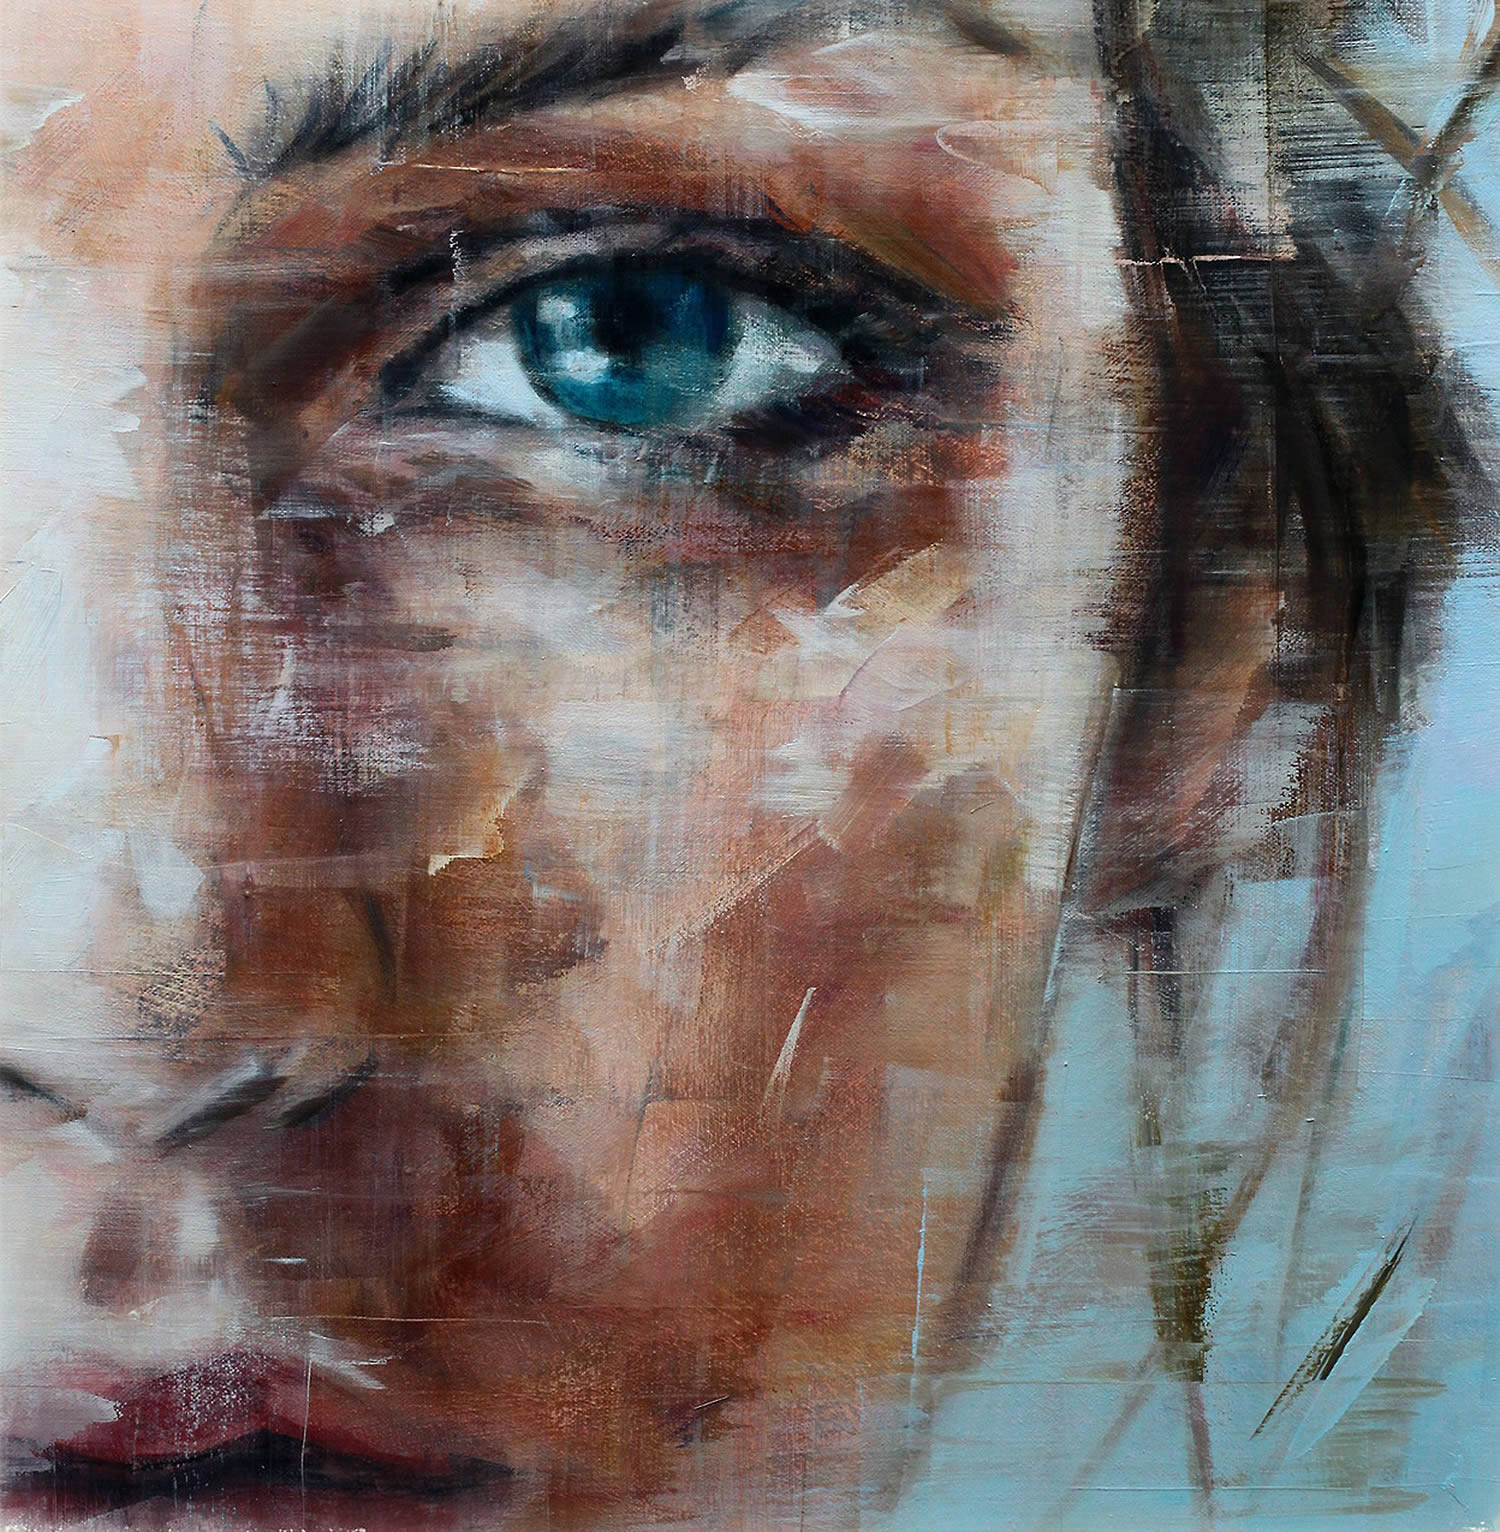 close-up, painting brushstrokes, eye, Harding Meyer